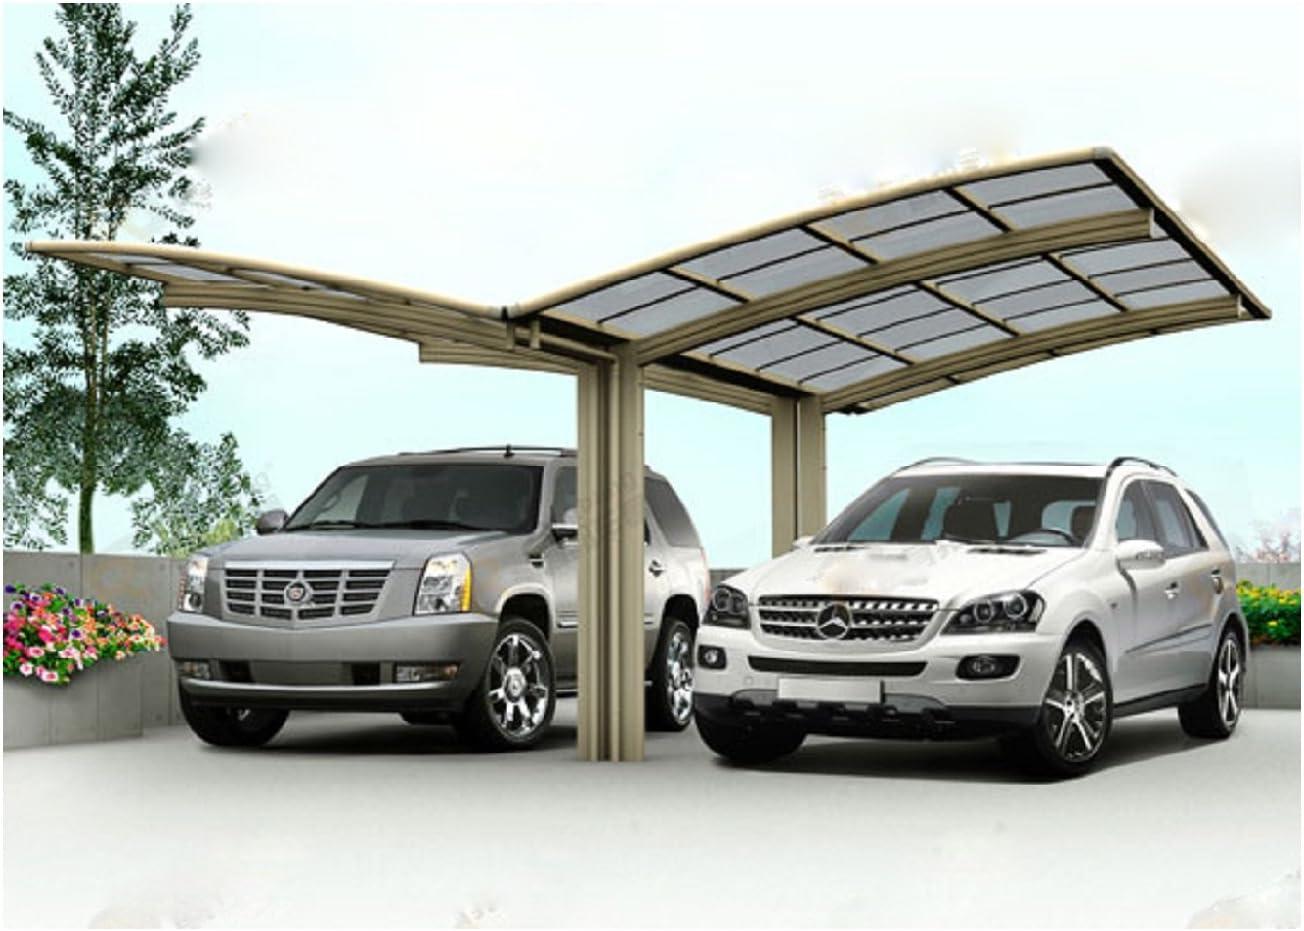 20 x 20 doble carports Metal Carport tienda garaje – Pérgola ...